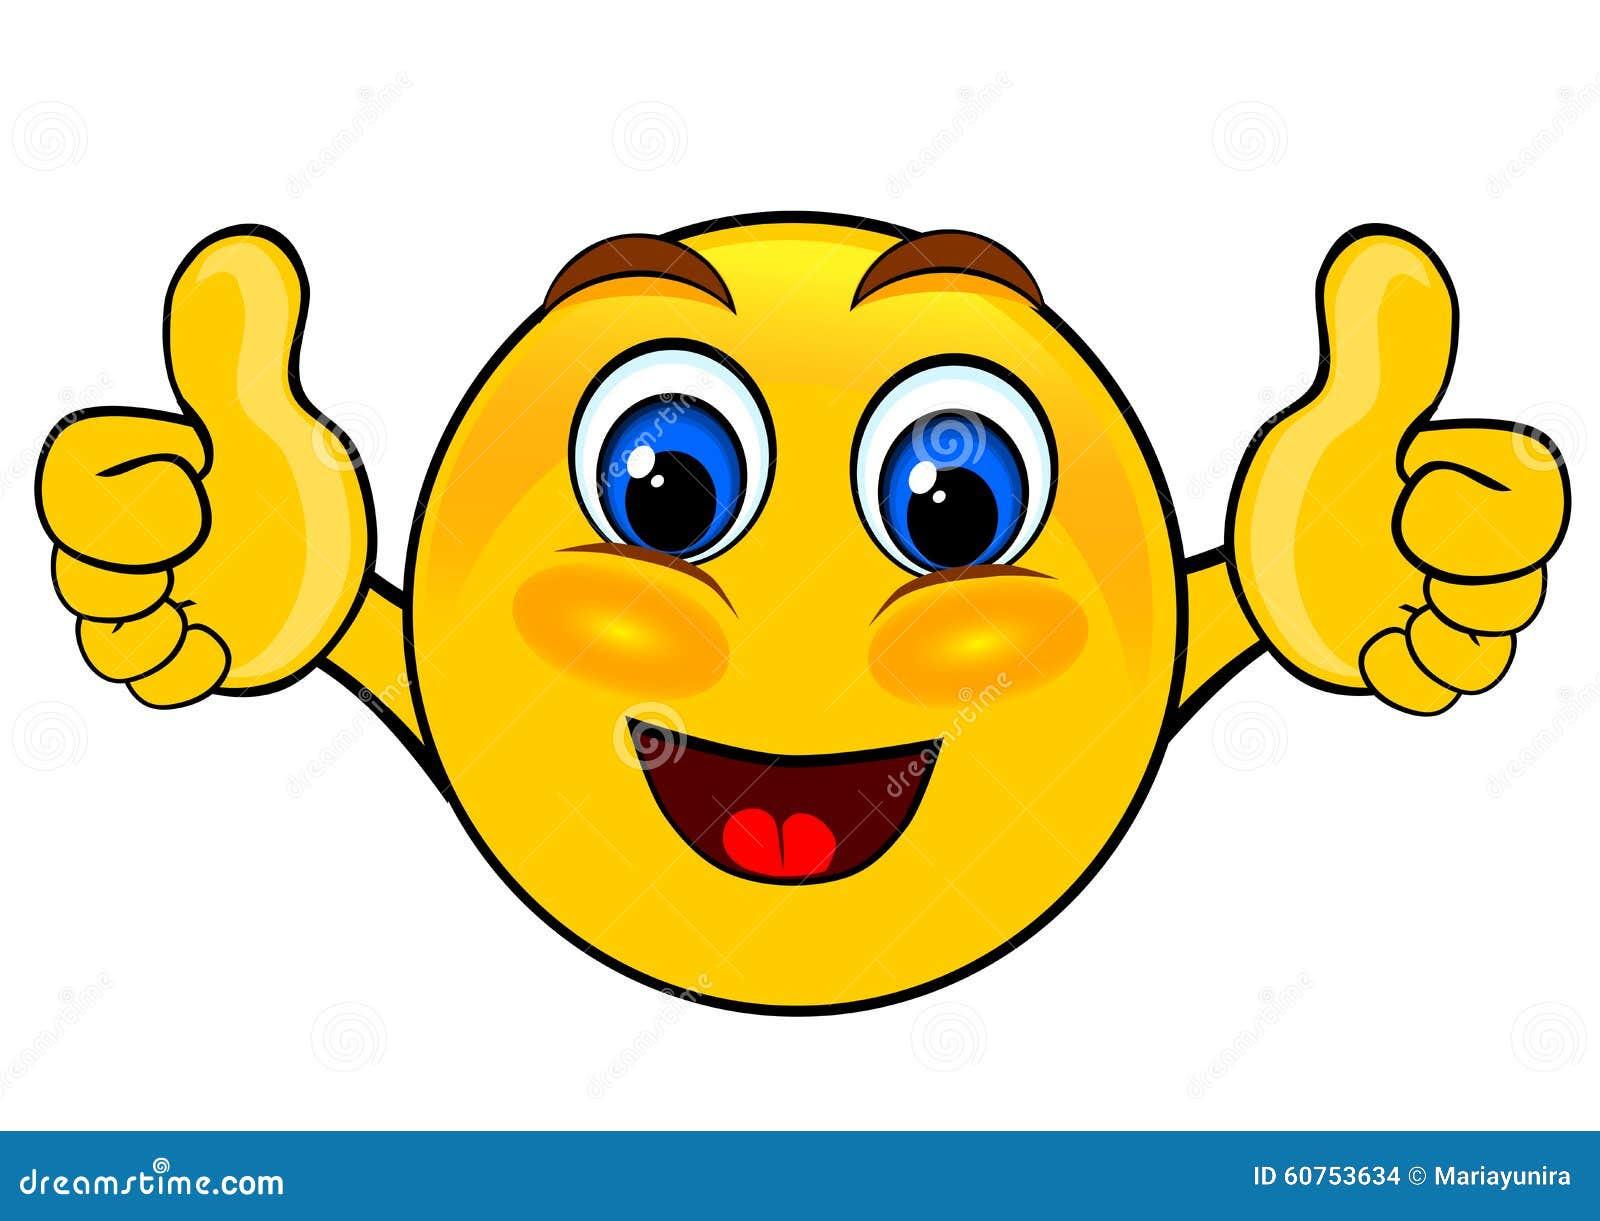 Image result for smile